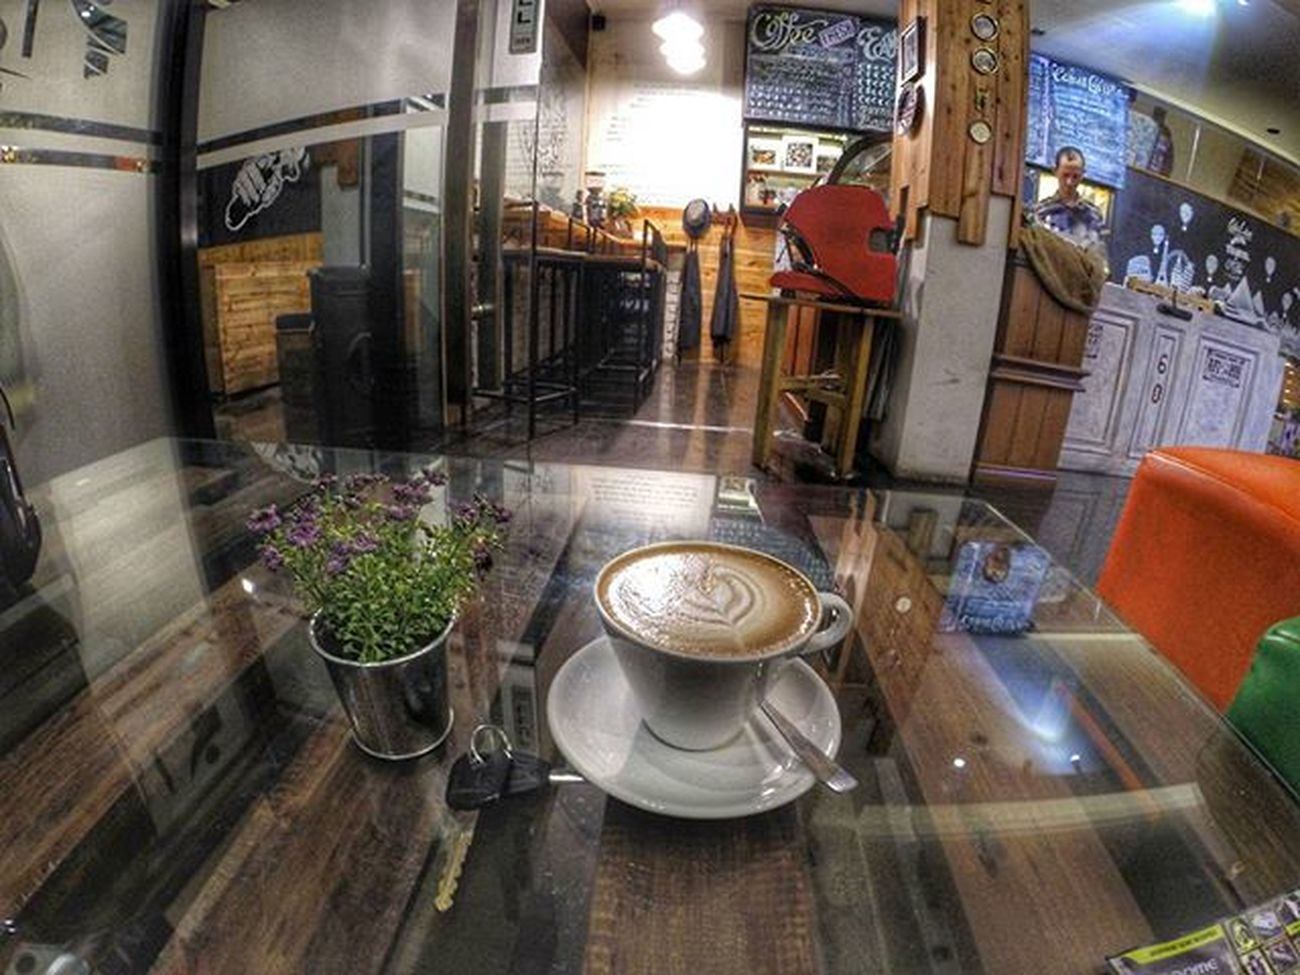 Coffee Coffeetime Mochachino Gopro Gopro3plus Goproblackedition Goproeverything Goprooftheday Goprohero3 Gopro_moment Val  2015  ☕